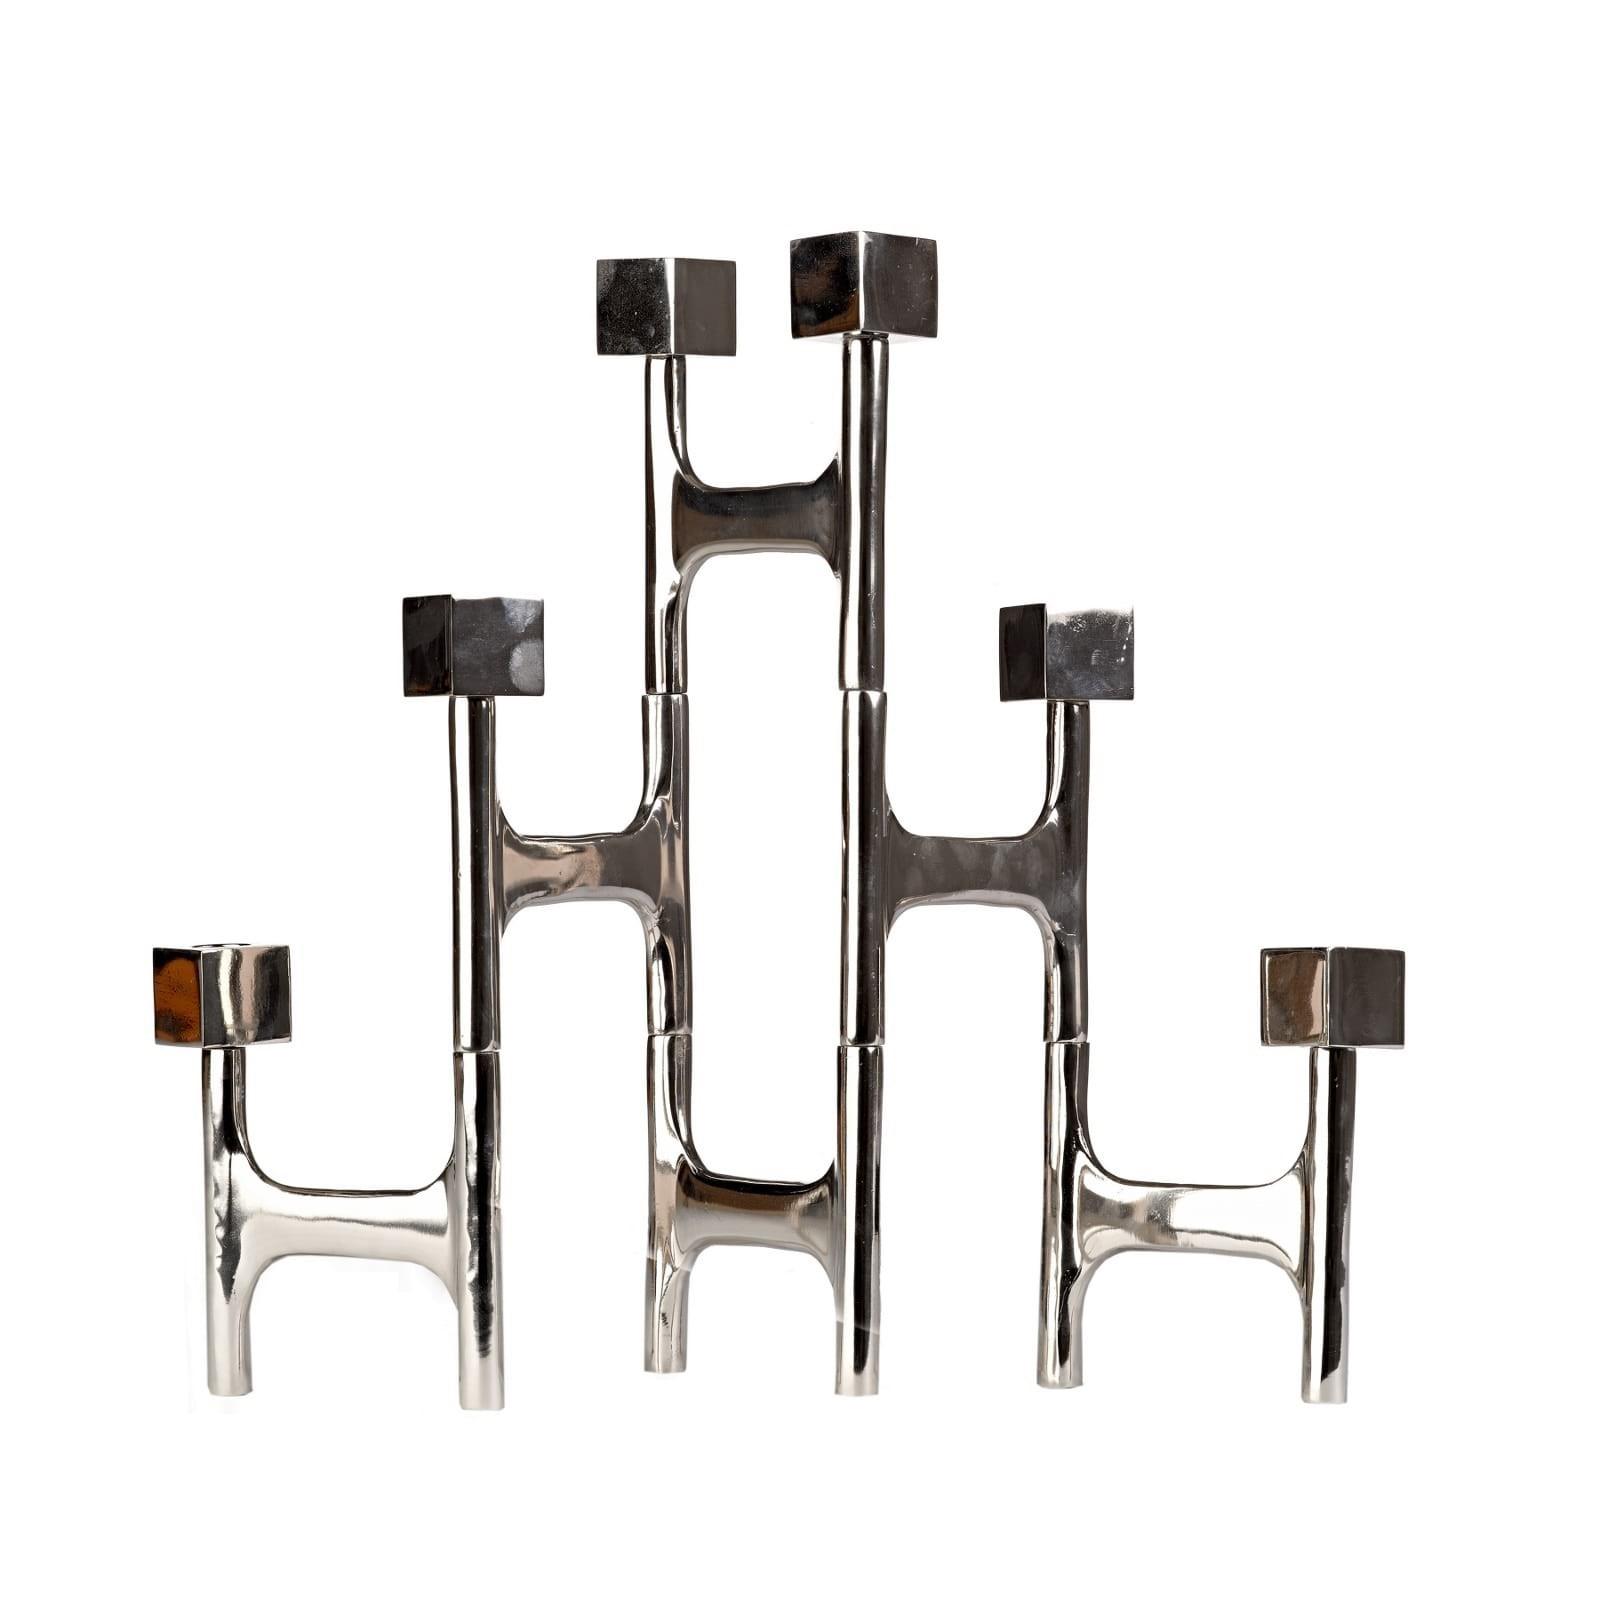 Candle Holder Folding Nickel Square - Pols Potten